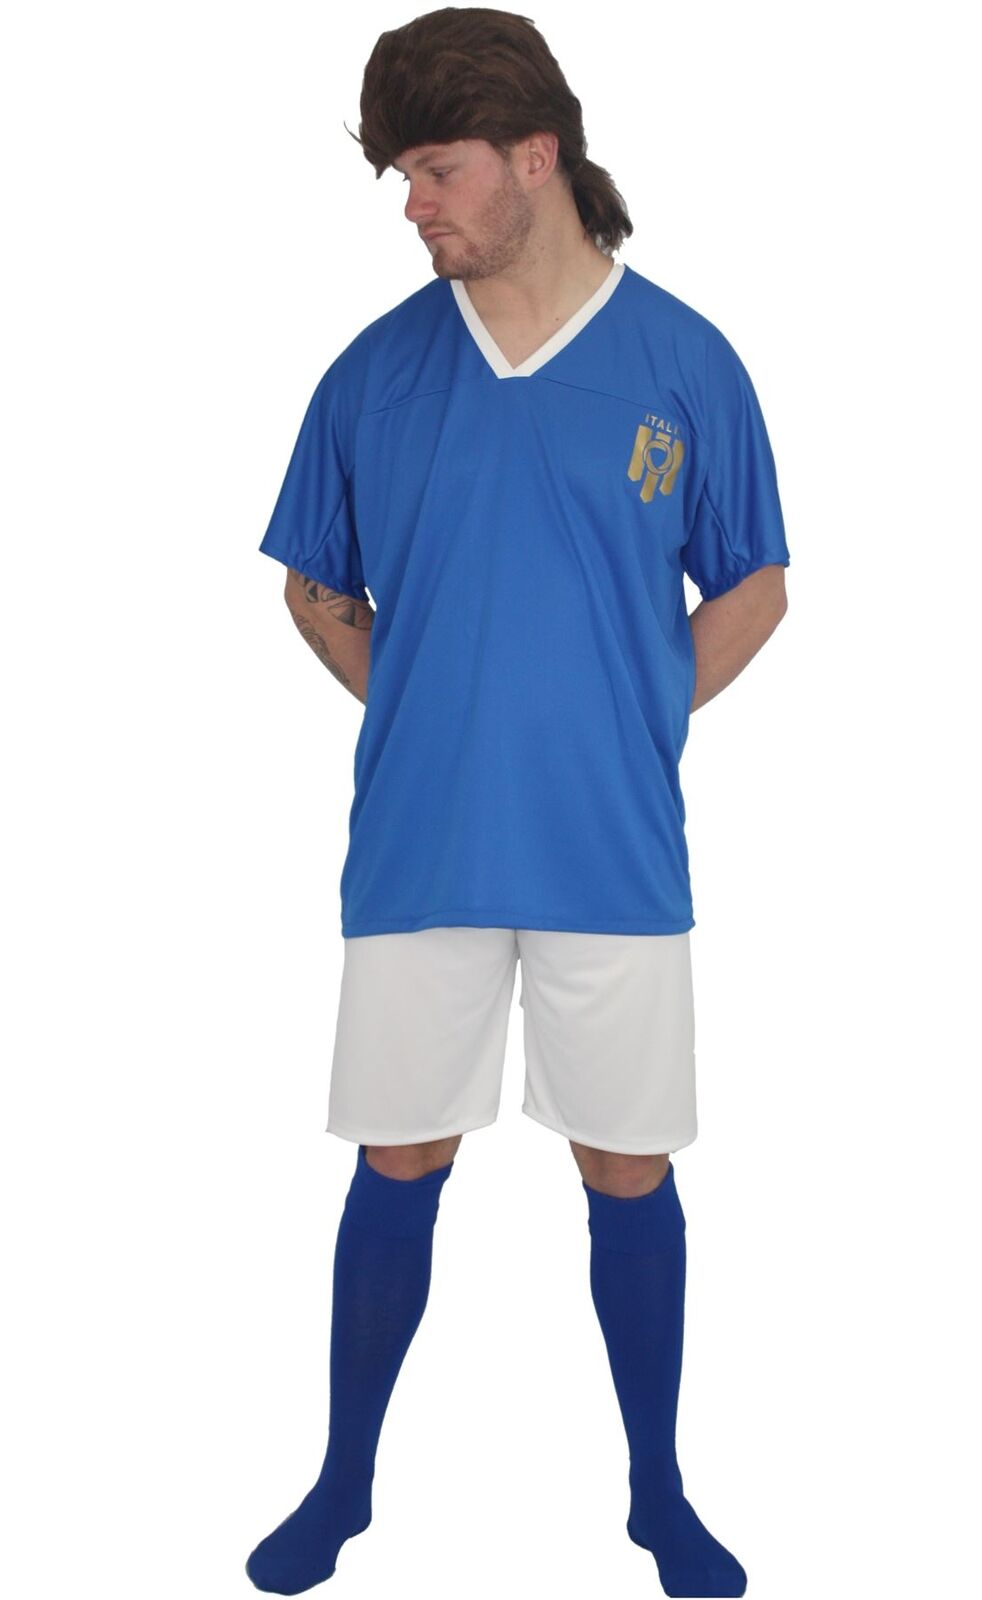 Adults  Football Icon Roberto Baggio Baggio Baggio Kit Fancy Dress & Wig | Elegantes Aussehen  | Charakteristisch  | Genial  442e5b